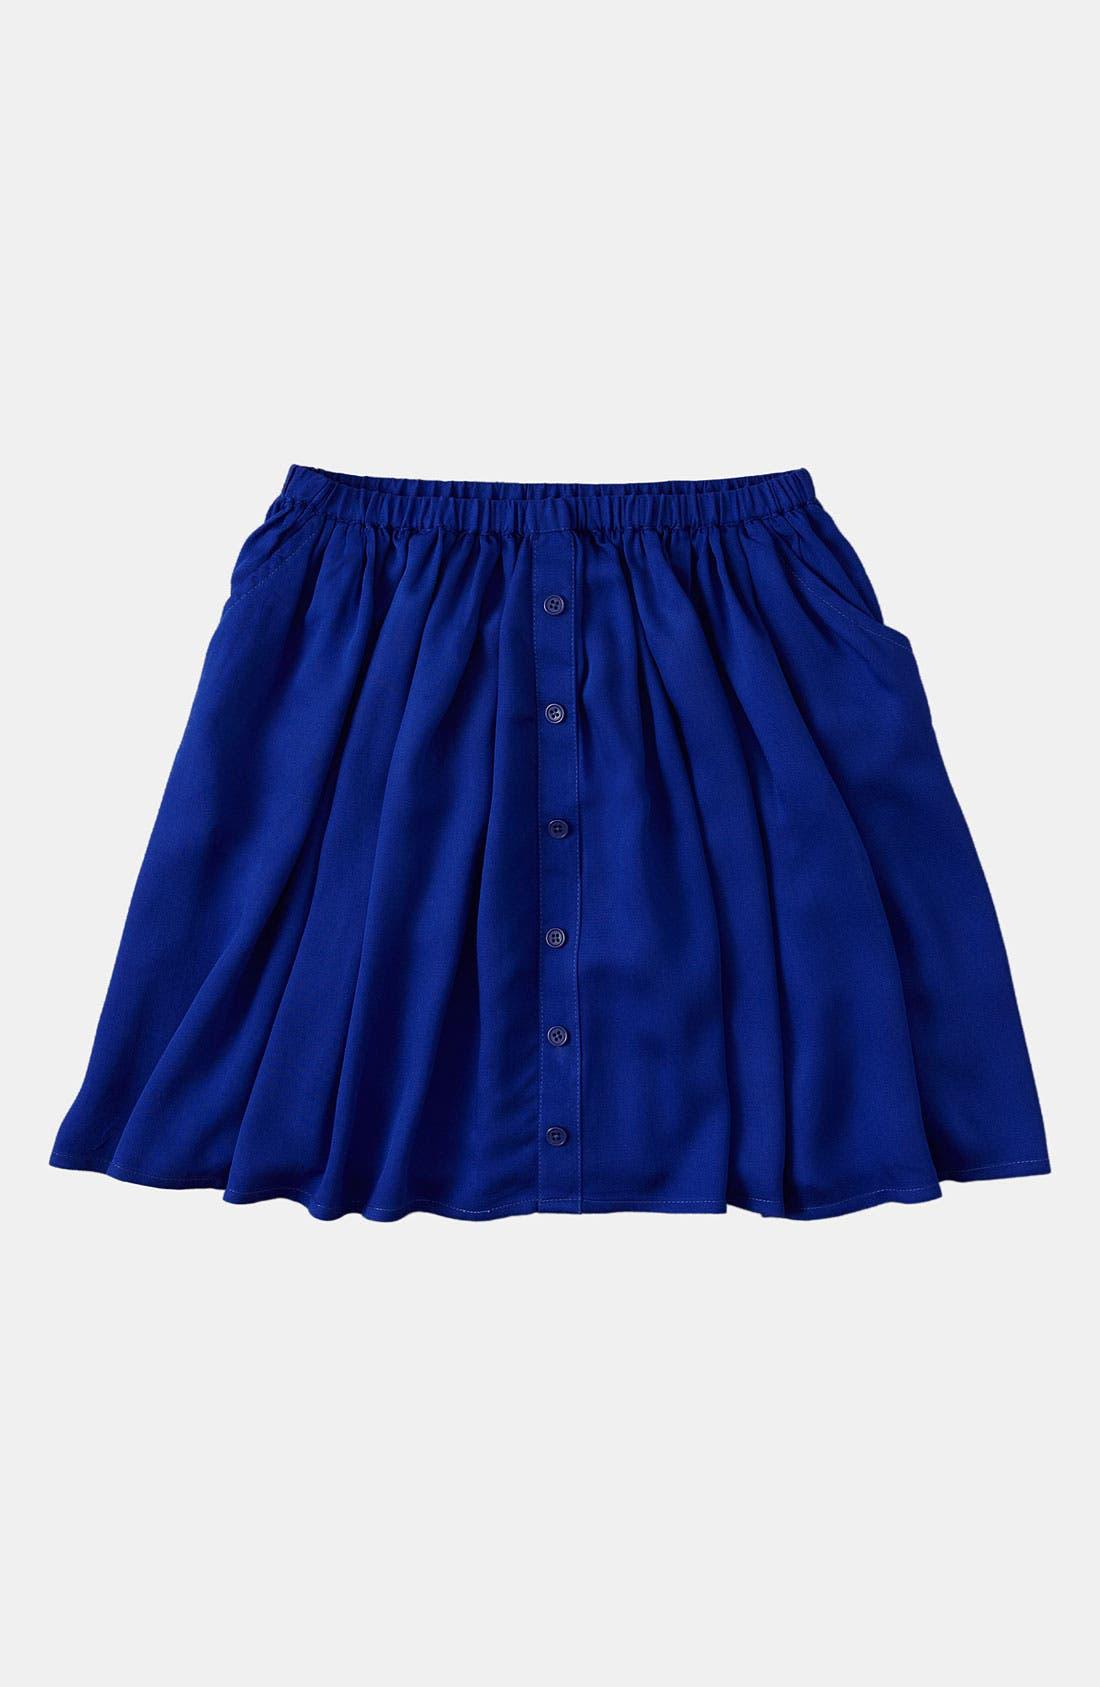 Main Image - Johnnie B by Boden Button Skirt (Big Girls)